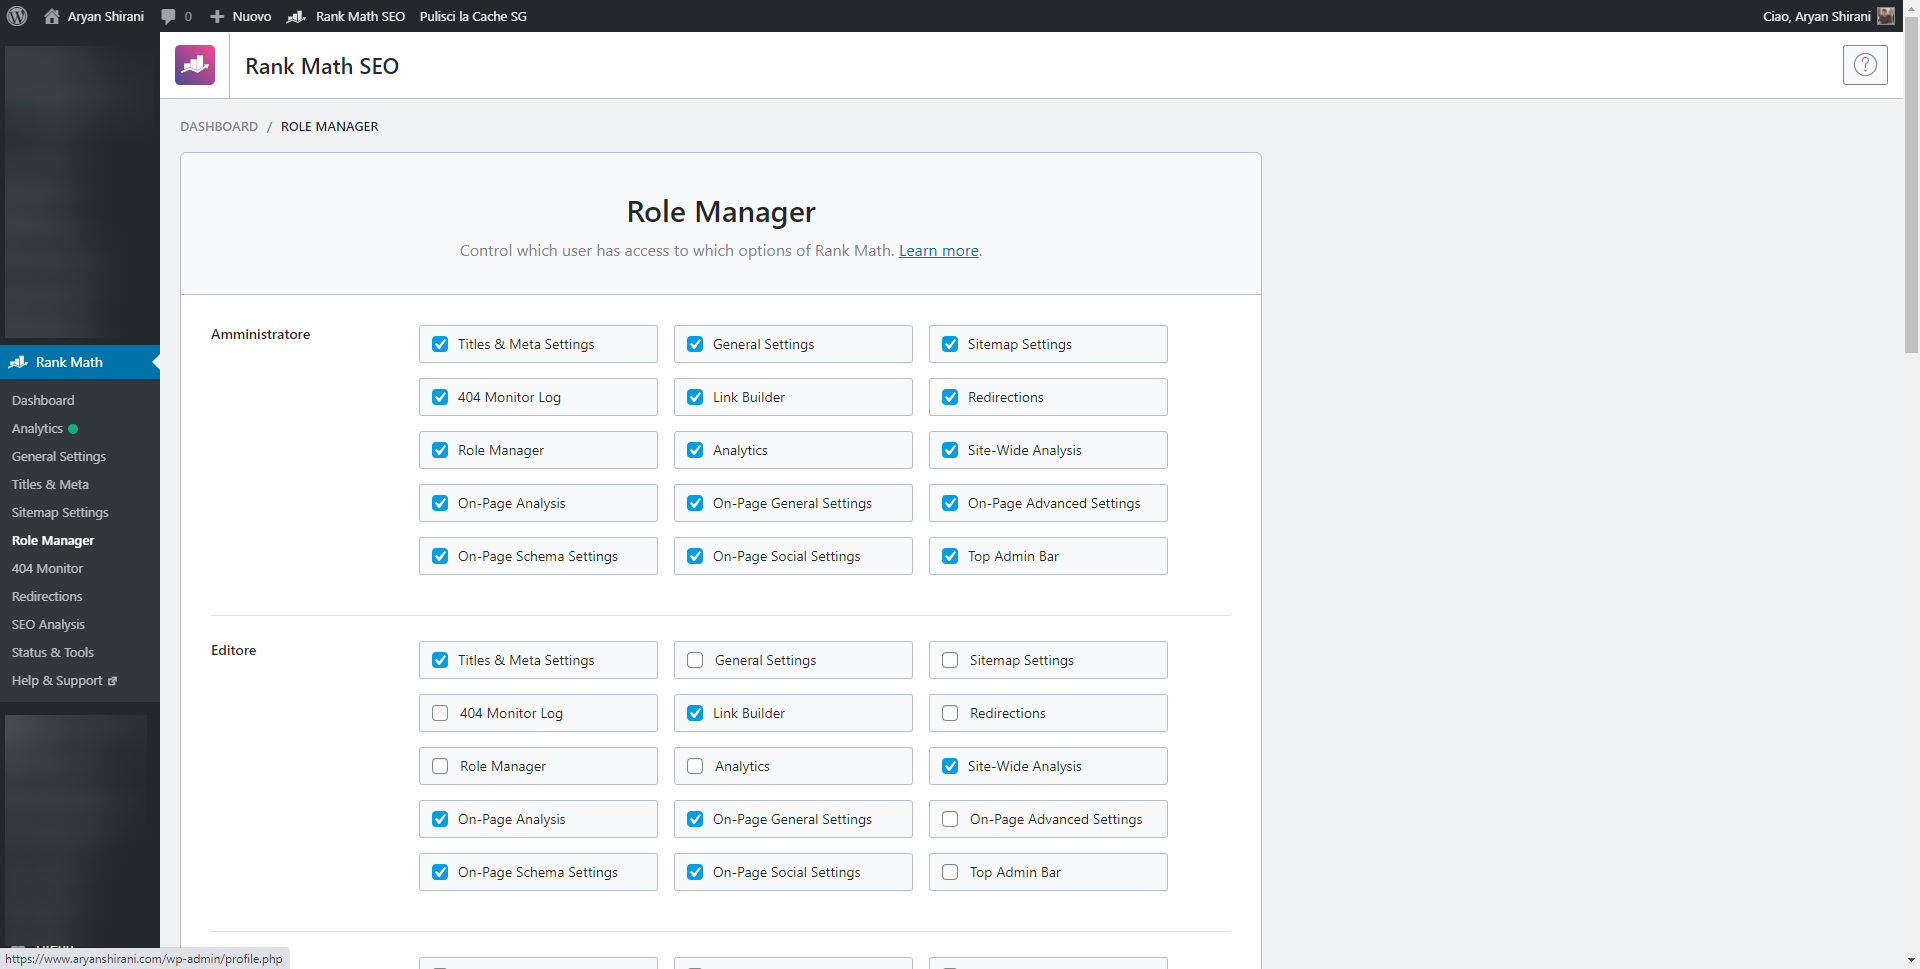 Rank math role manager impostazione ruoli